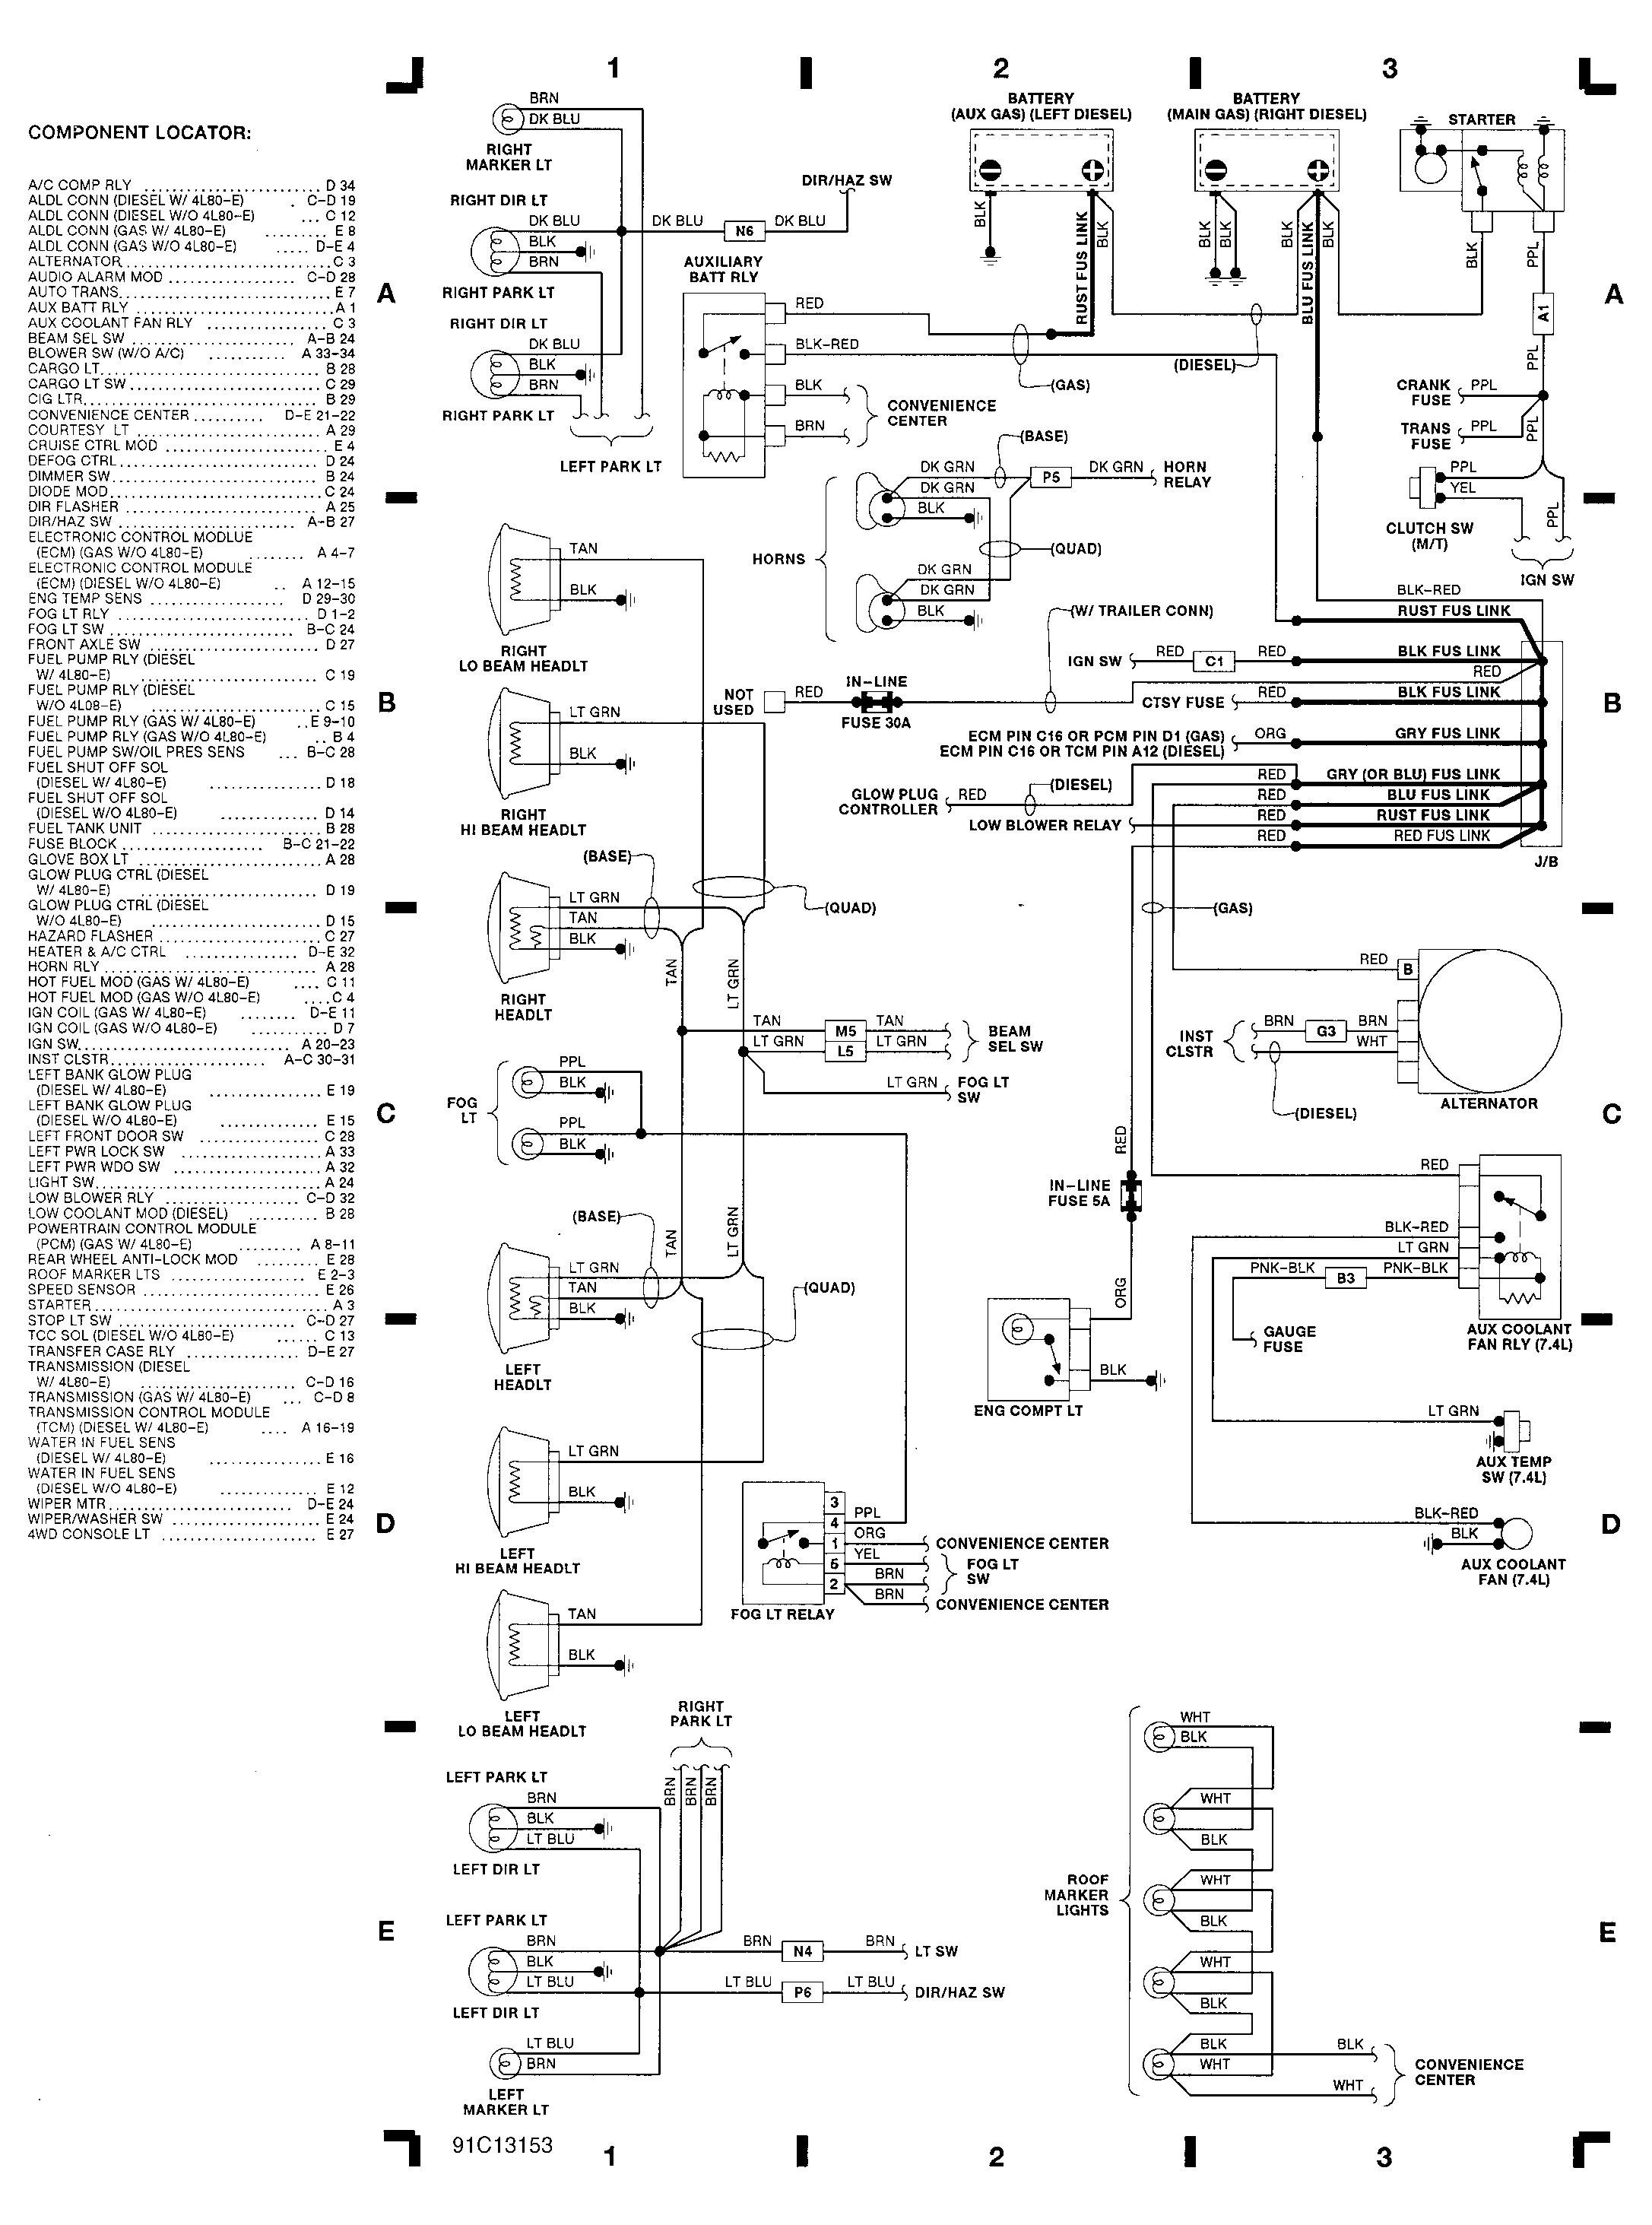 3400 Sfi Engine Cooling System Diagram Clifford224 194 Clifford224 195 Engines Transmission Of 3400 Sfi Engine Cooling System Diagram